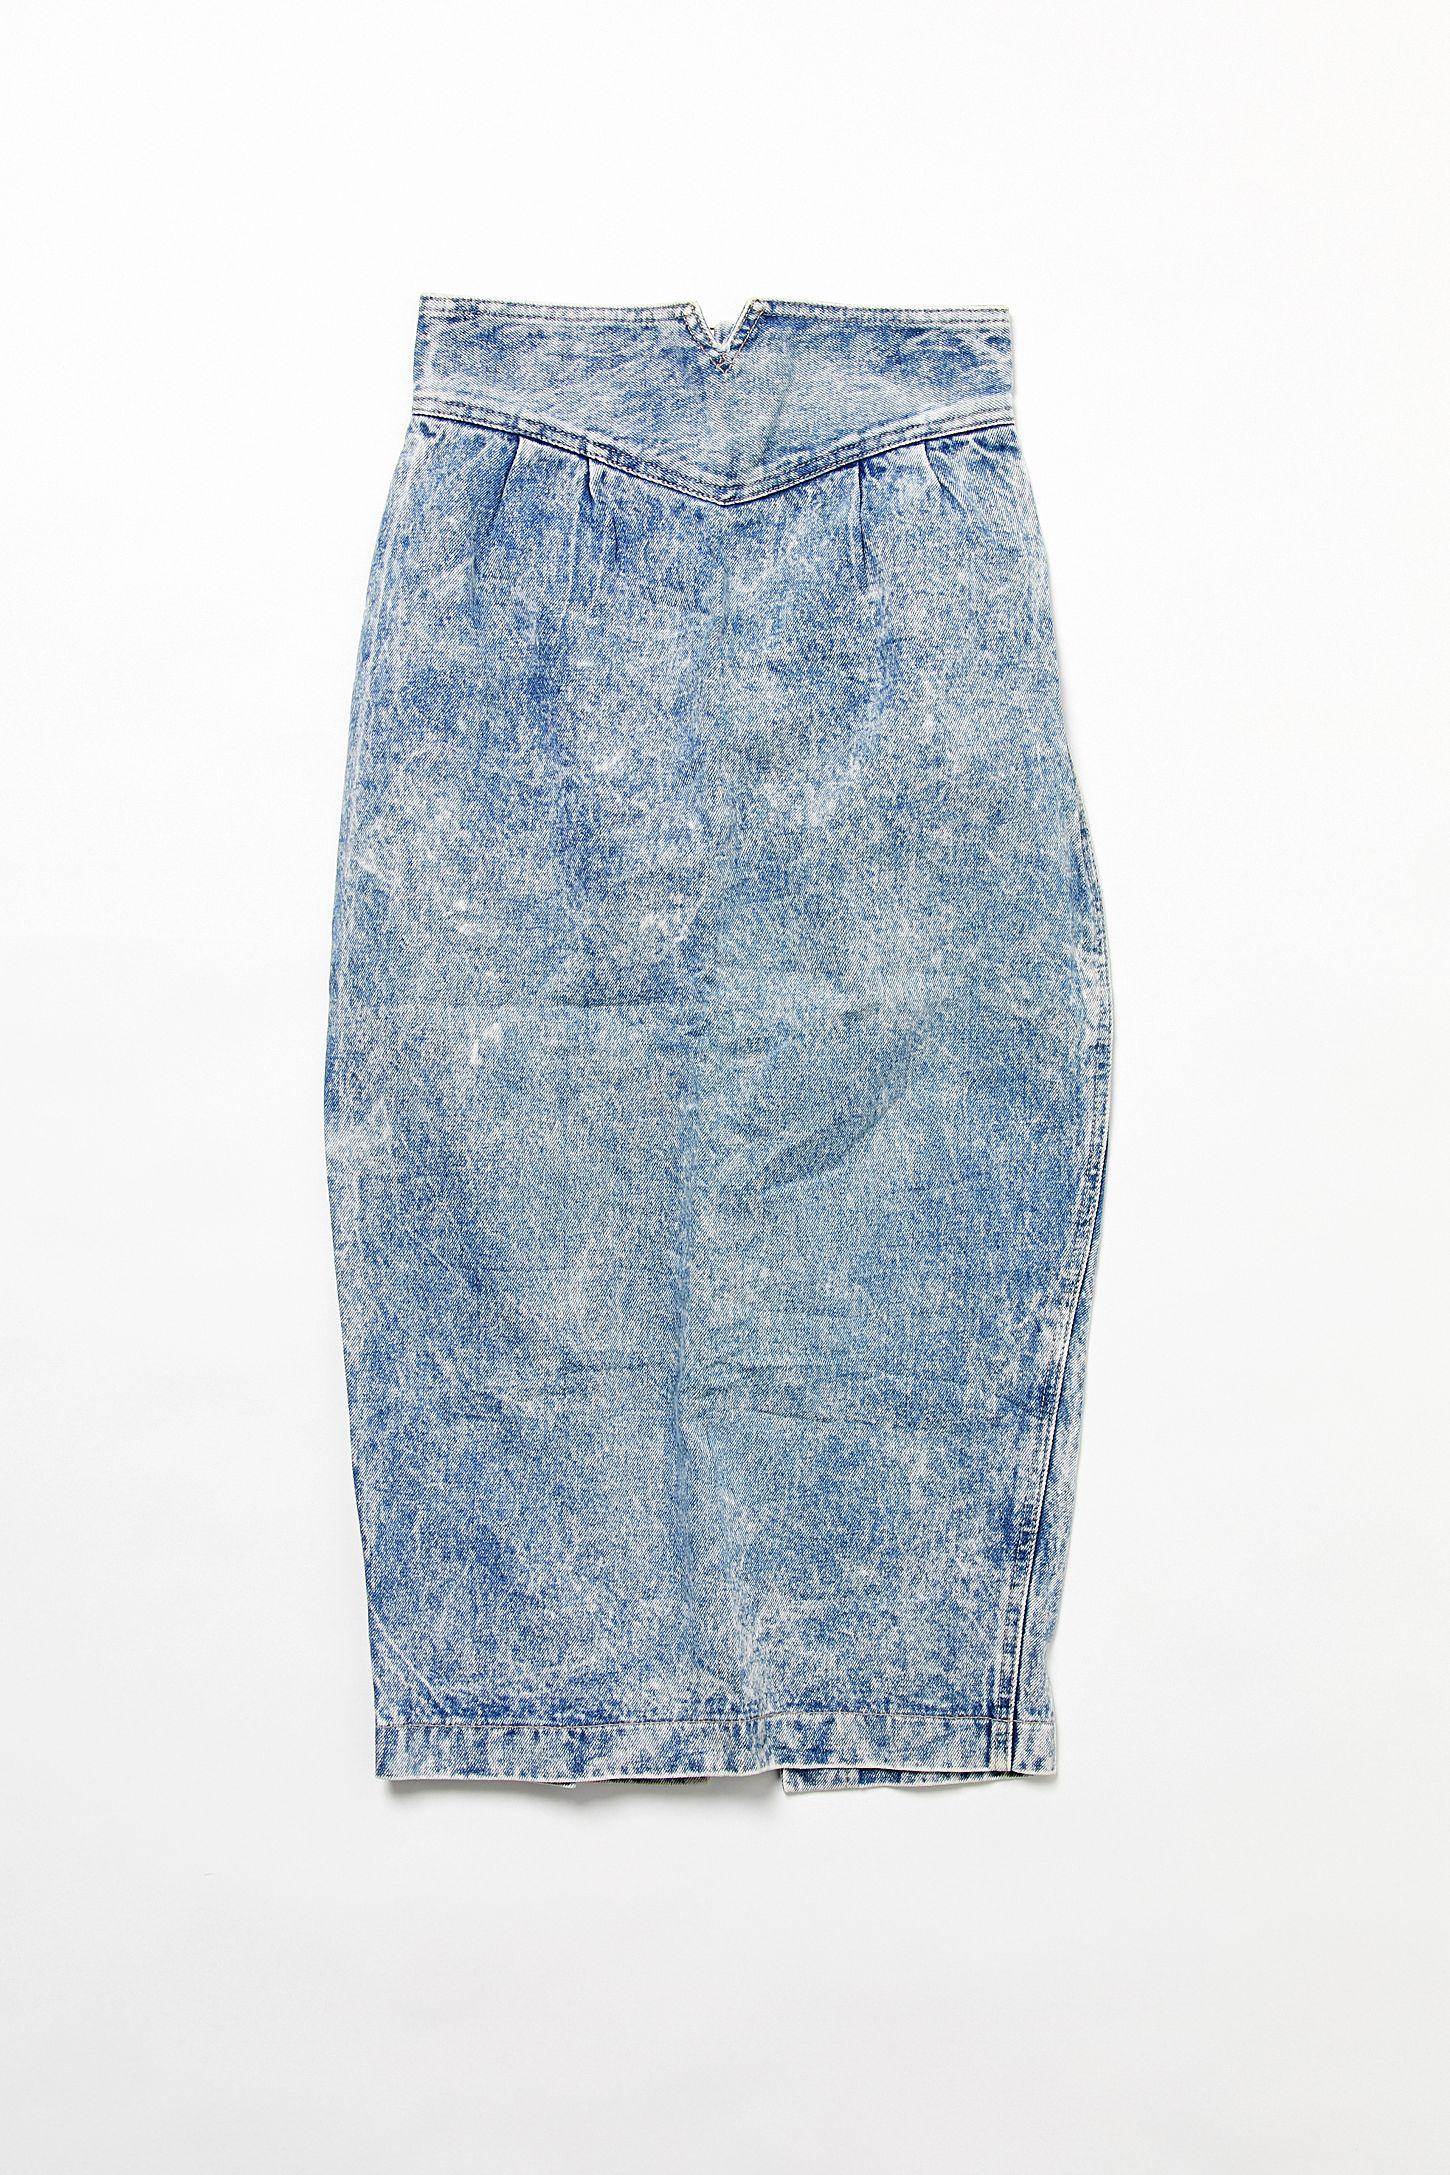 b8d27a706 Urban Outfitters Denim Pencil Skirt | Huston Fislar Photography